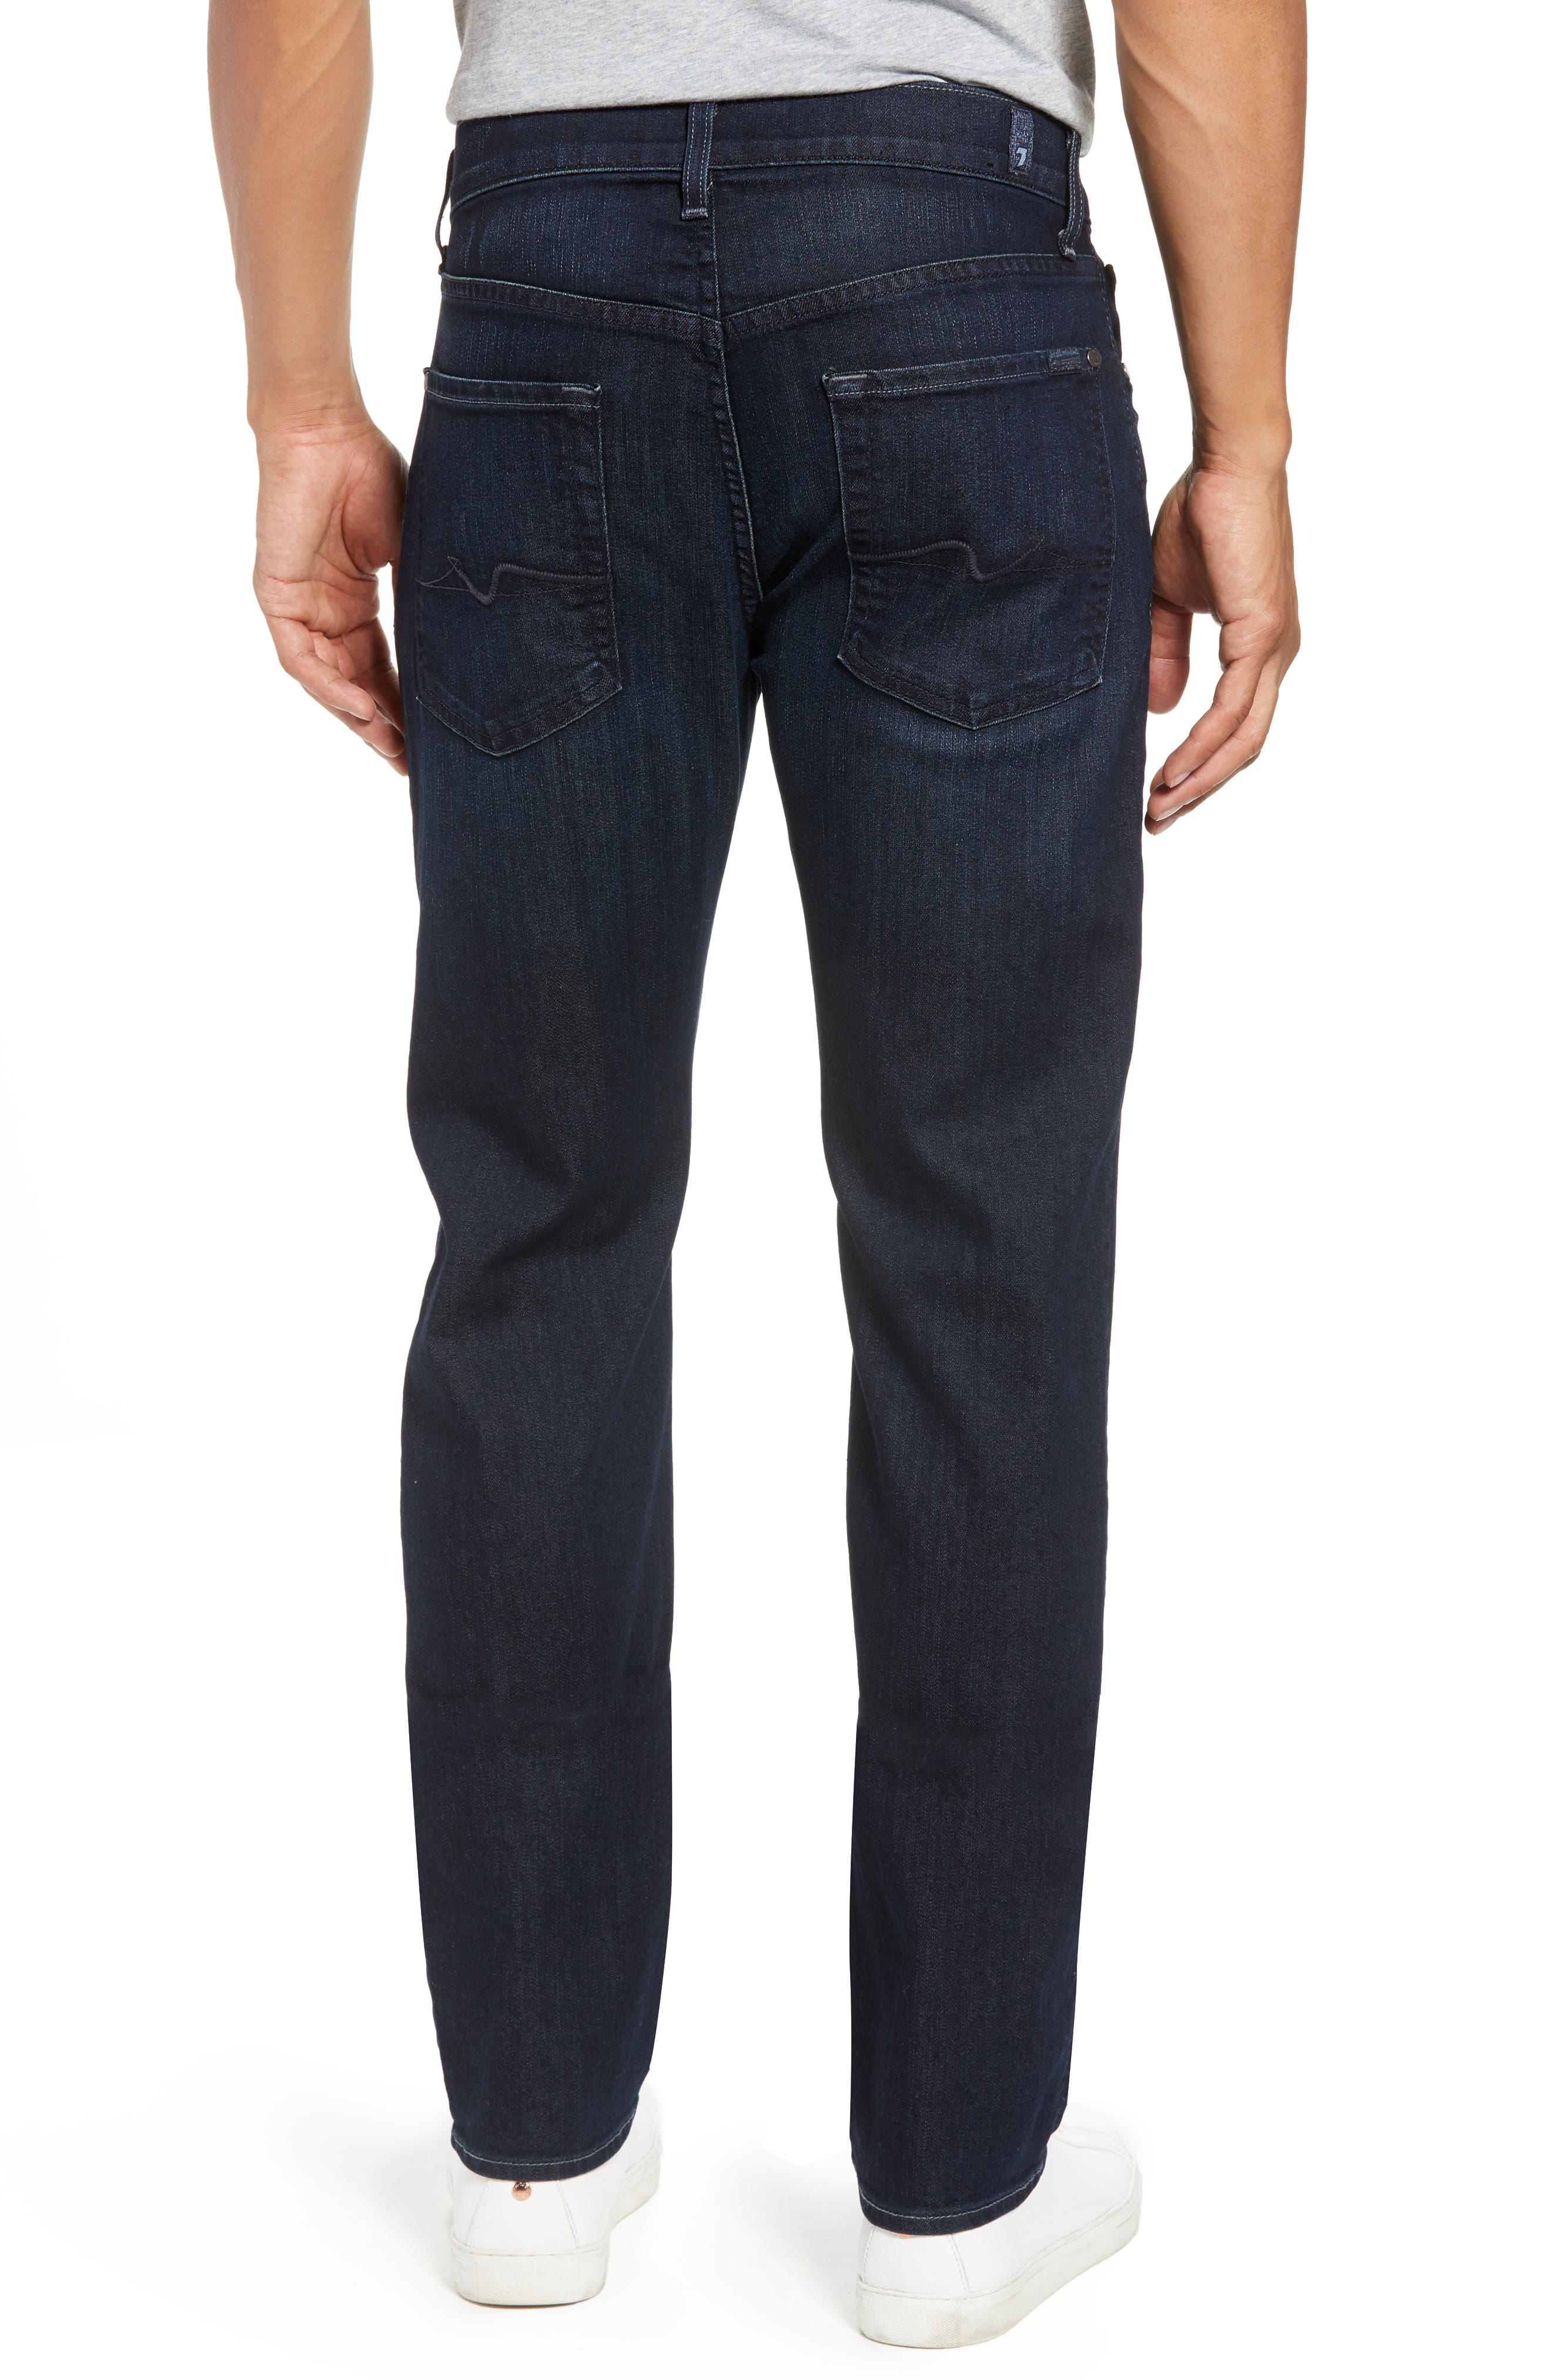 Airweft Standard Straight Leg Jeans,                             Alternate thumbnail 2, color,                             PERENNIAL